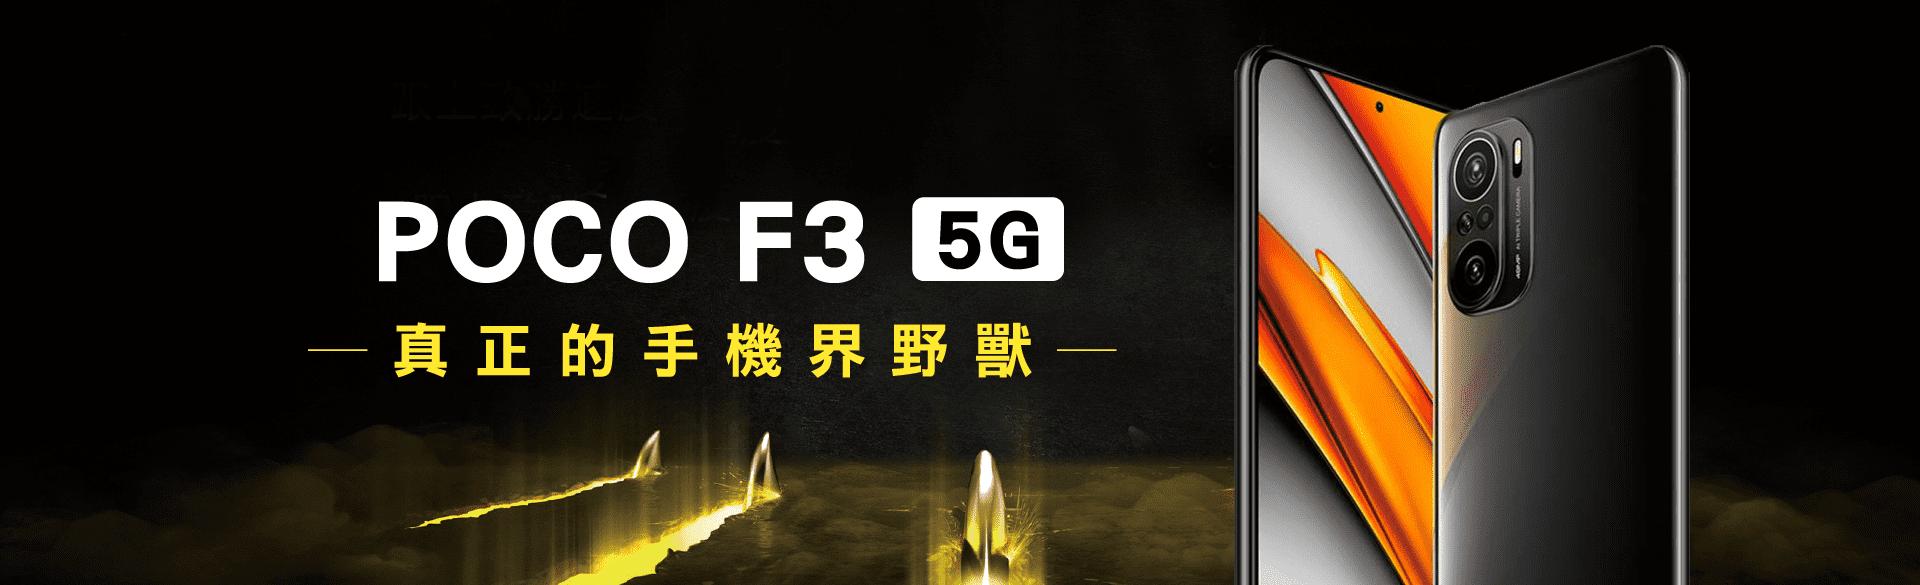 POCO Phone F3